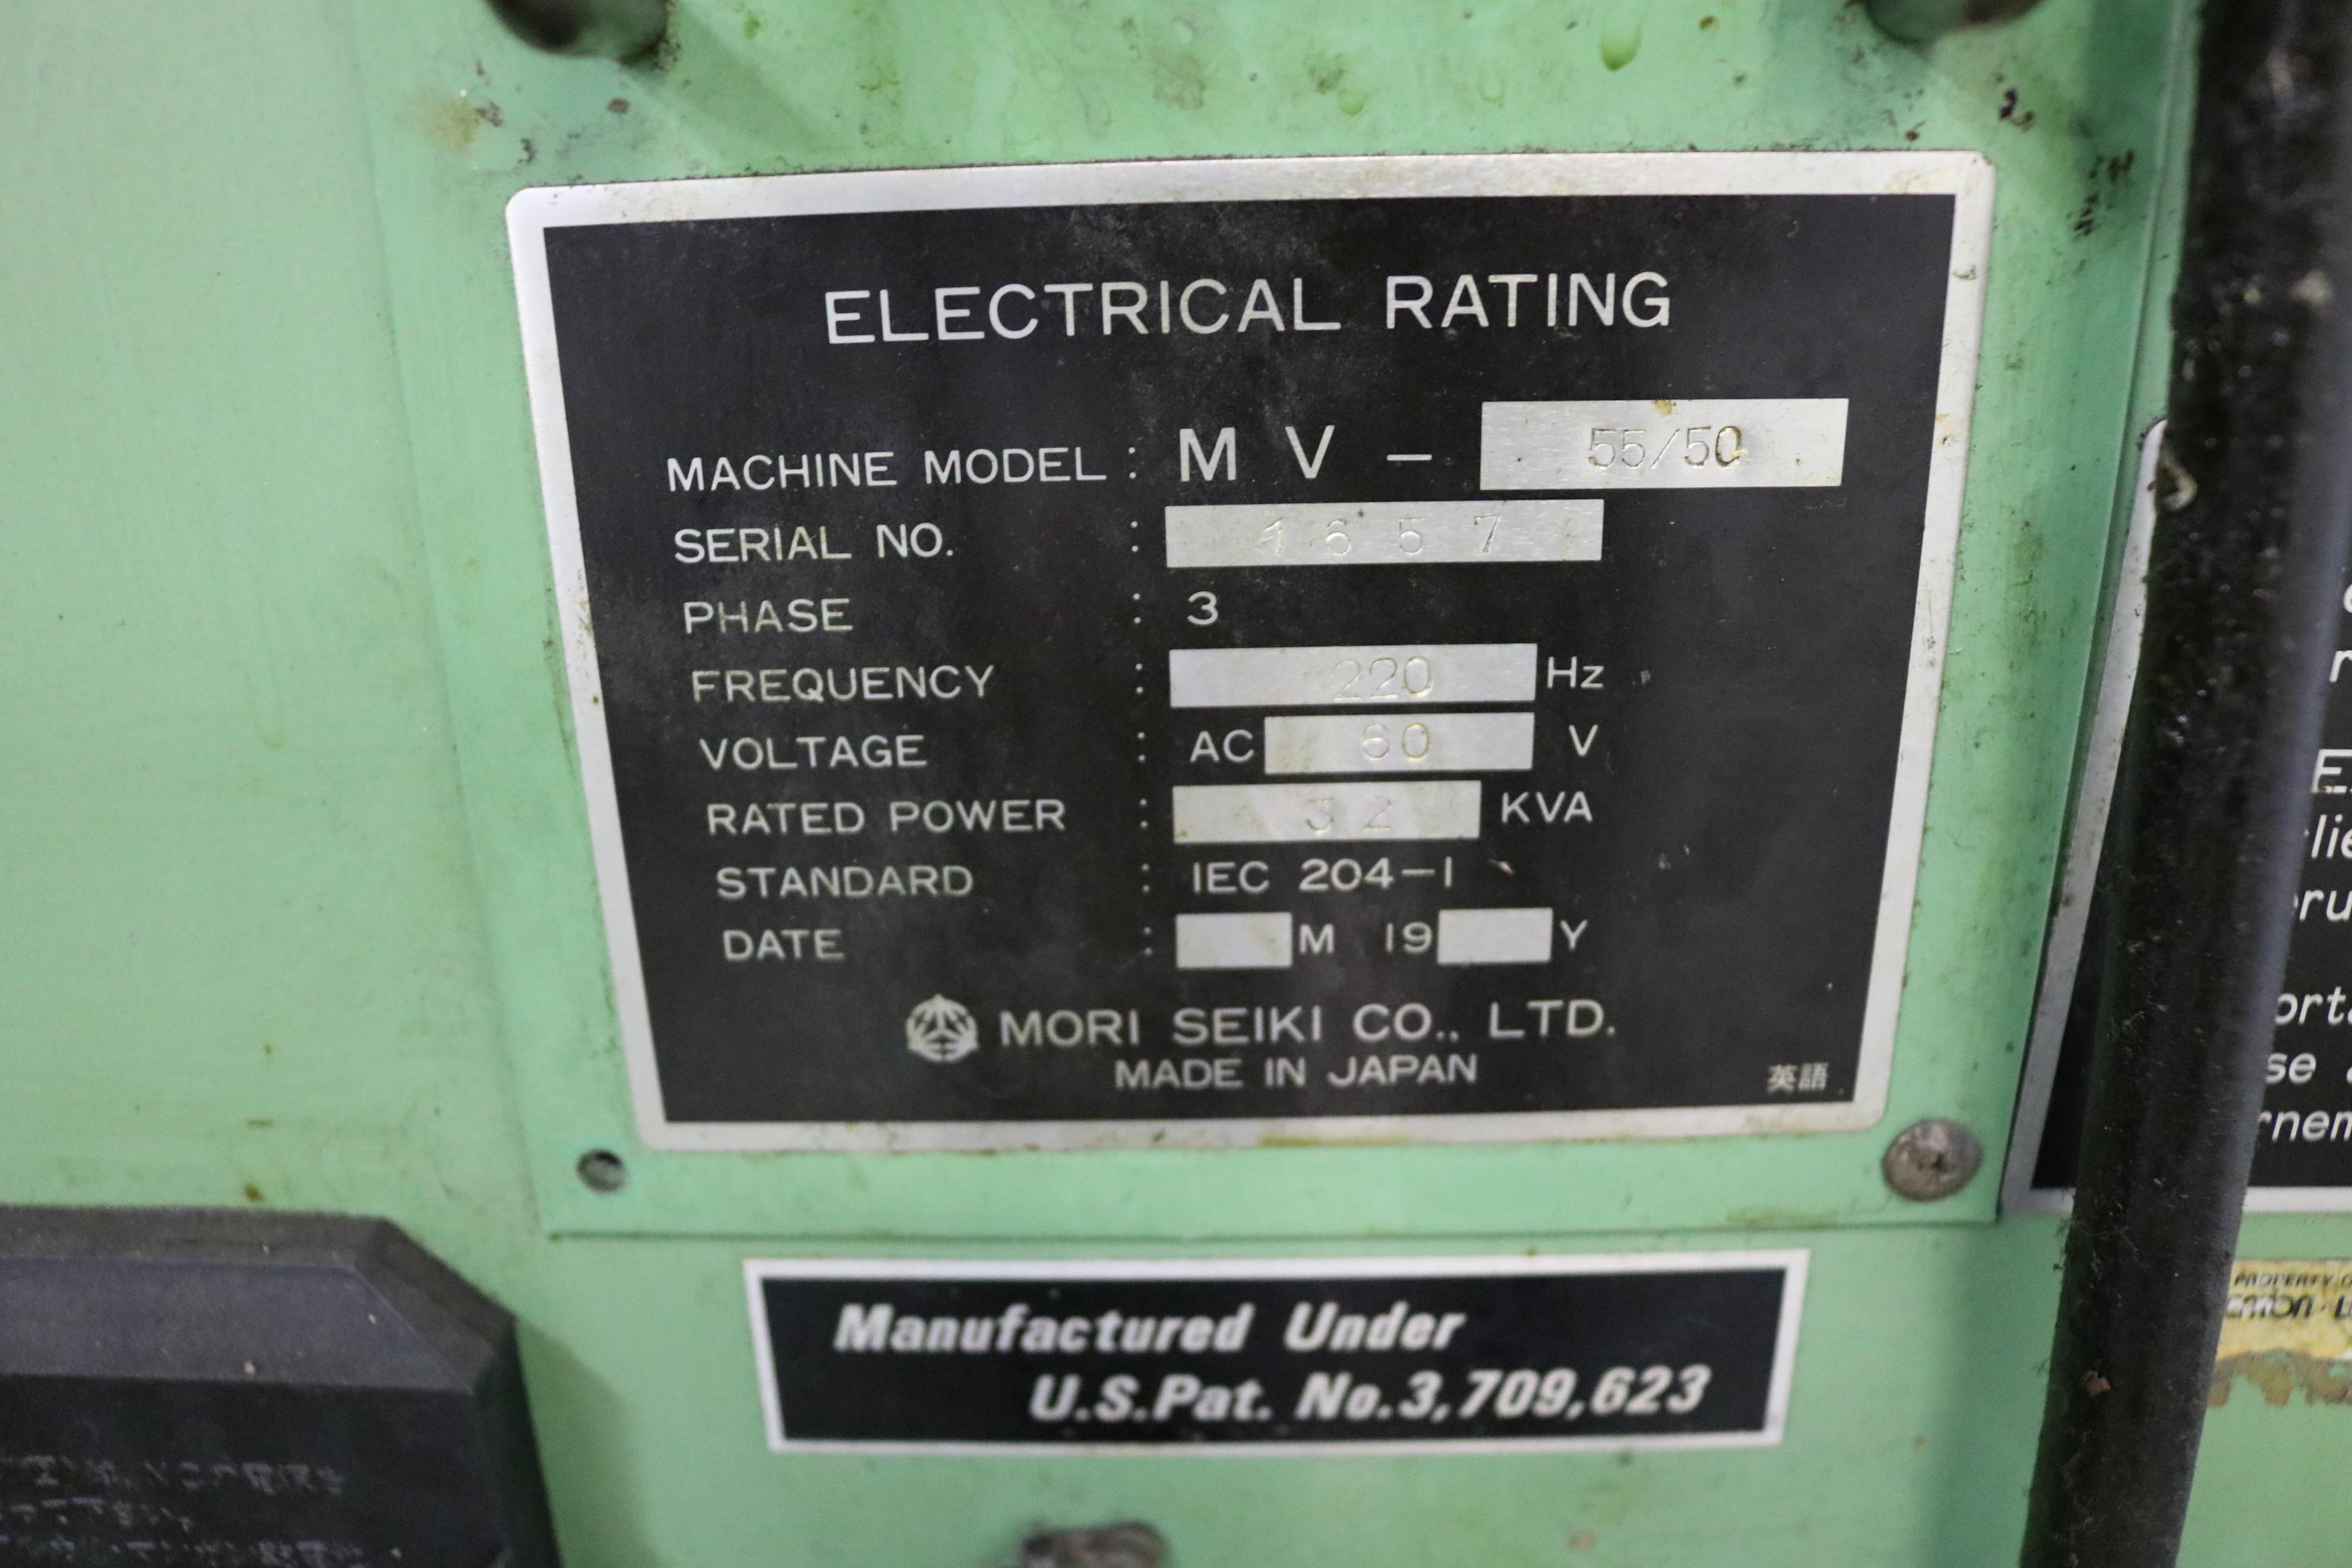 "Lot 6 - MORI SEIKI MV-55/50 CNC VERTICAL MACHINING CENTER, TRAVELS: 41"" X 21"" X 22"", 55"" X 21"" TABLE, 4000"